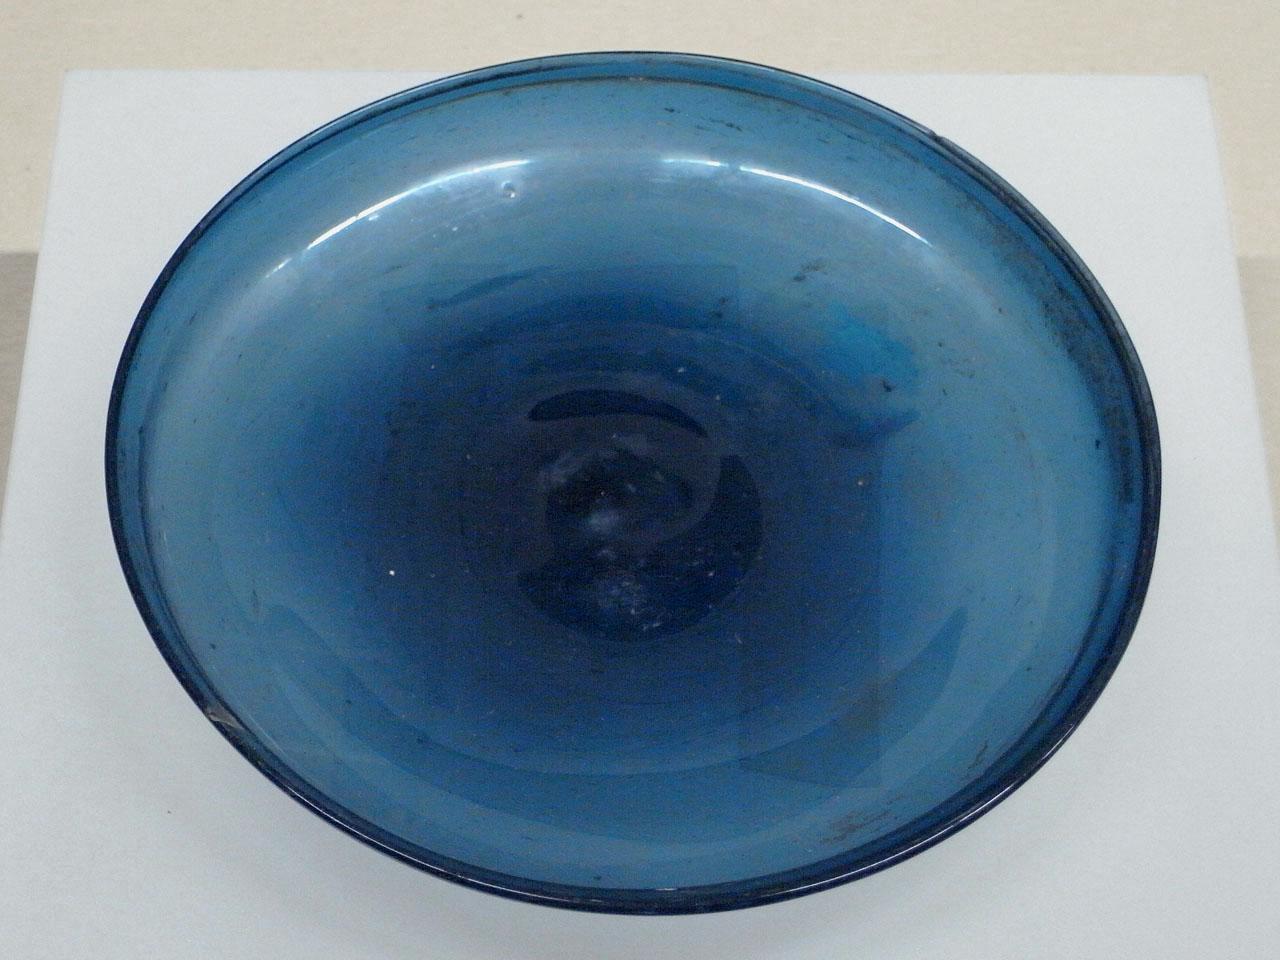 tang-verre-bleu